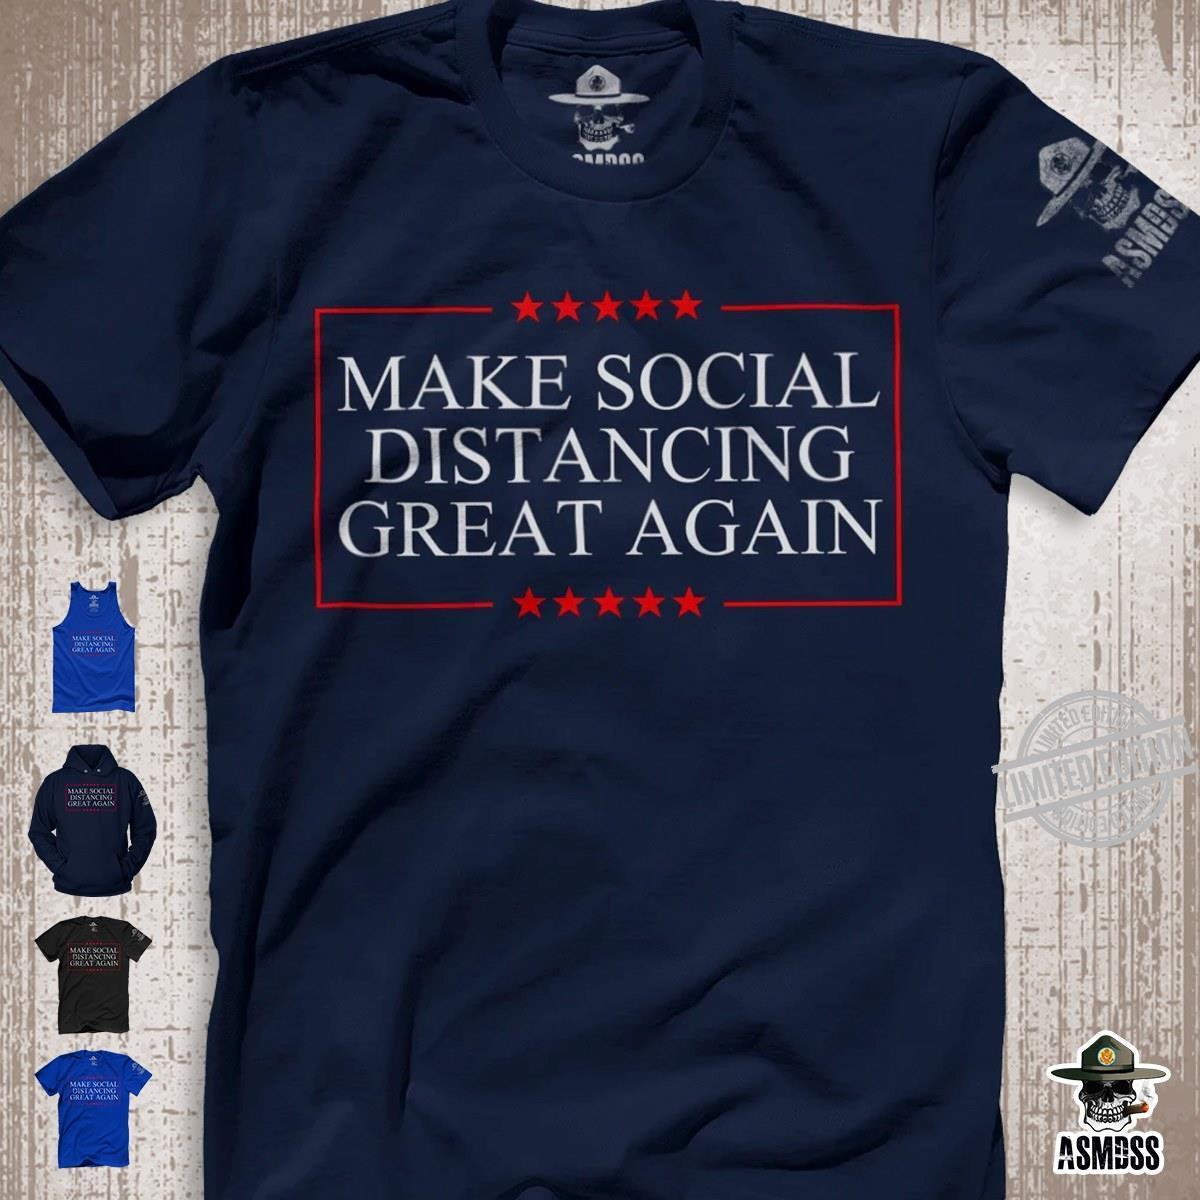 Make Social Distancing Great Again Shirt